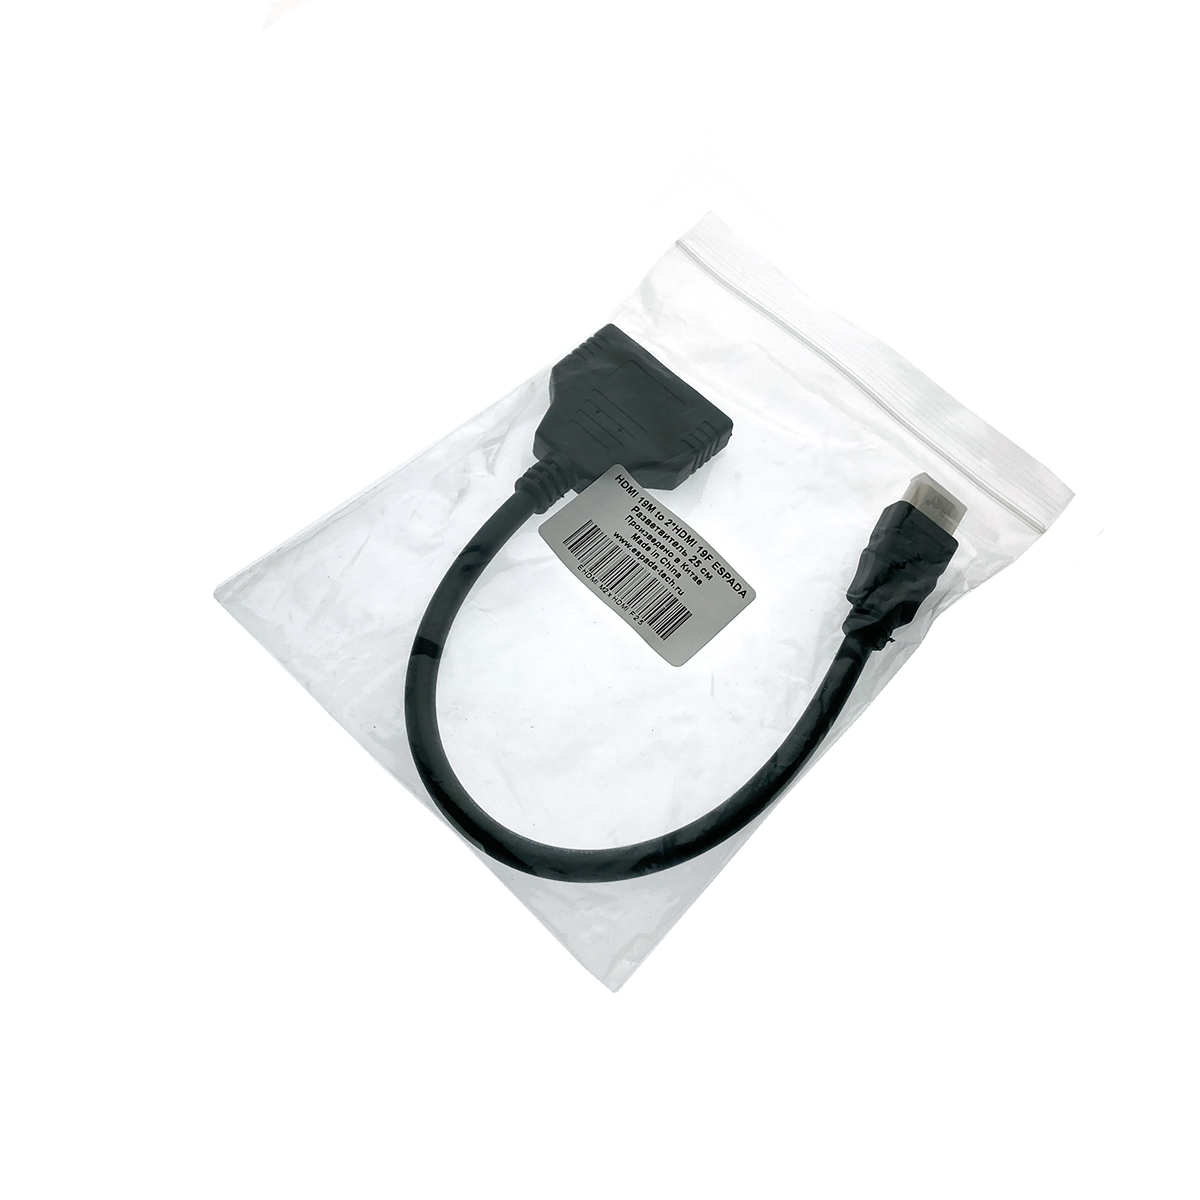 Разветвитель HDMI 19 pin male to 2*HDMI 19 pin female 25cм, Espada EHDMIM2xHDMIF25